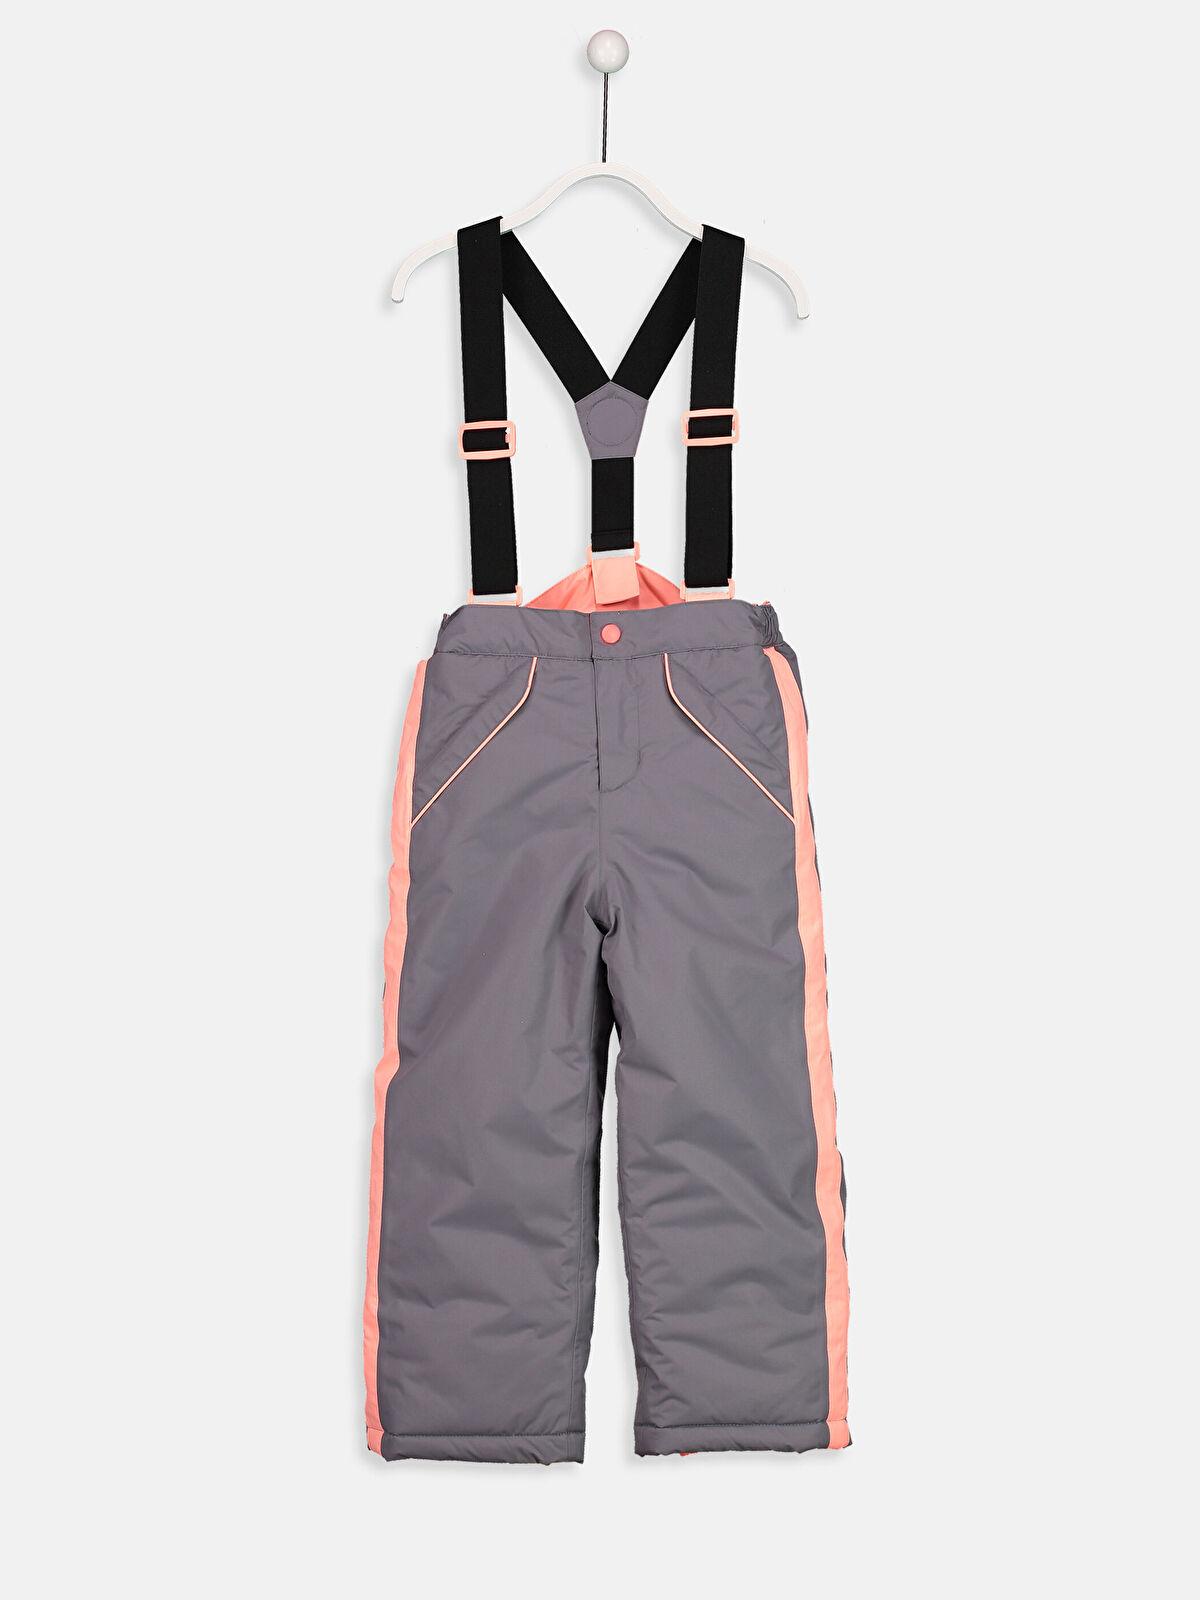 Kız Çocuk Kayak Pantolon - LC WAIKIKI